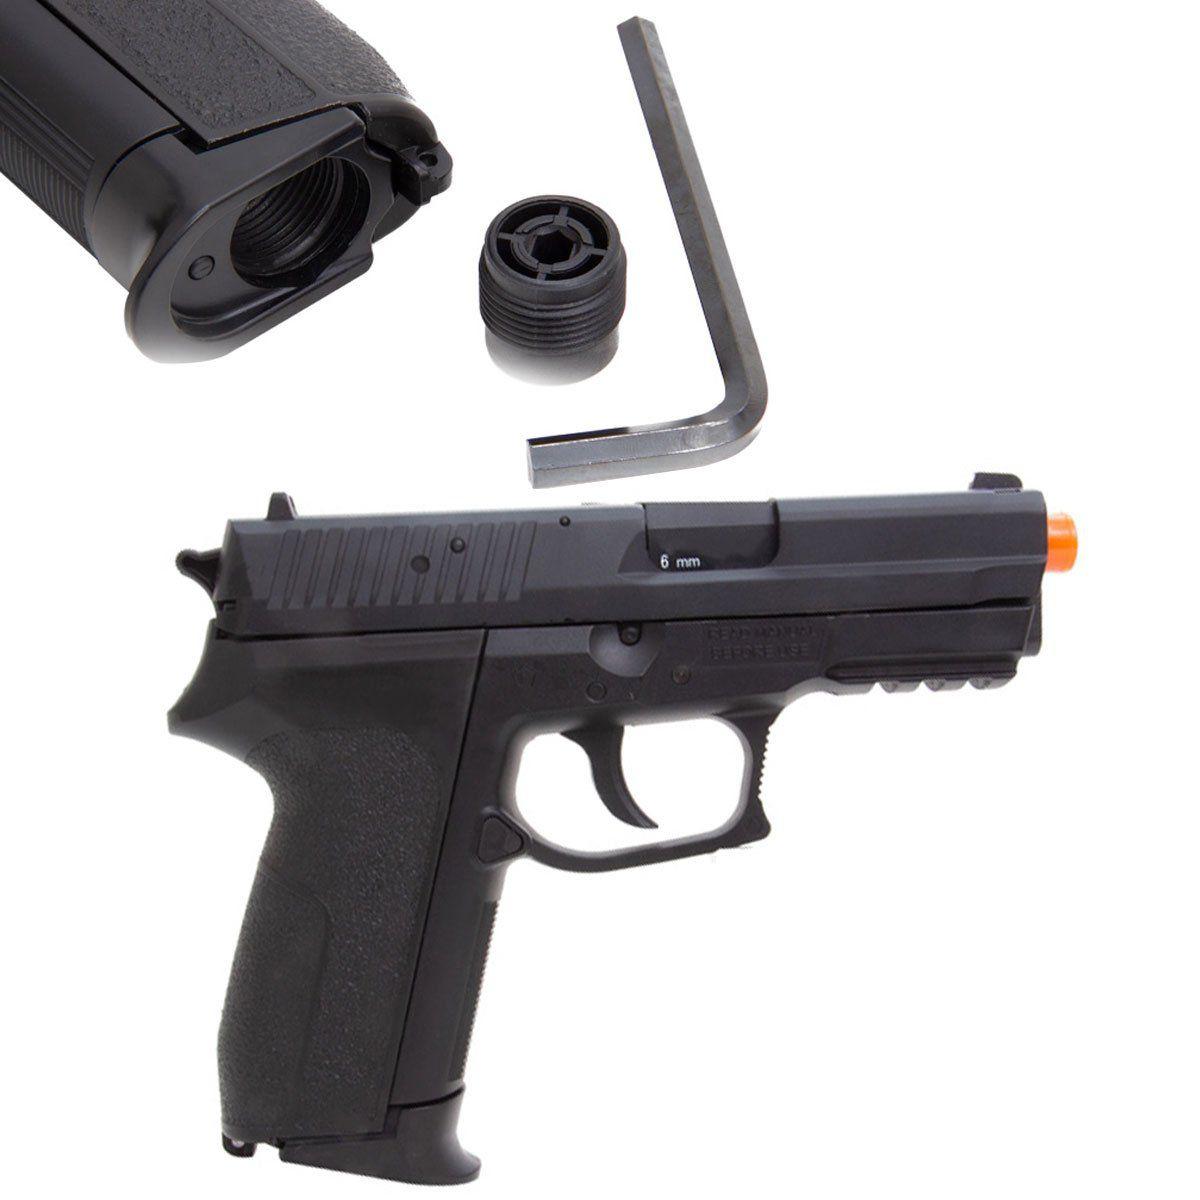 Pistola de Airsoft KWC SIG SP2022 Slide Metal GBB CO2 6mm